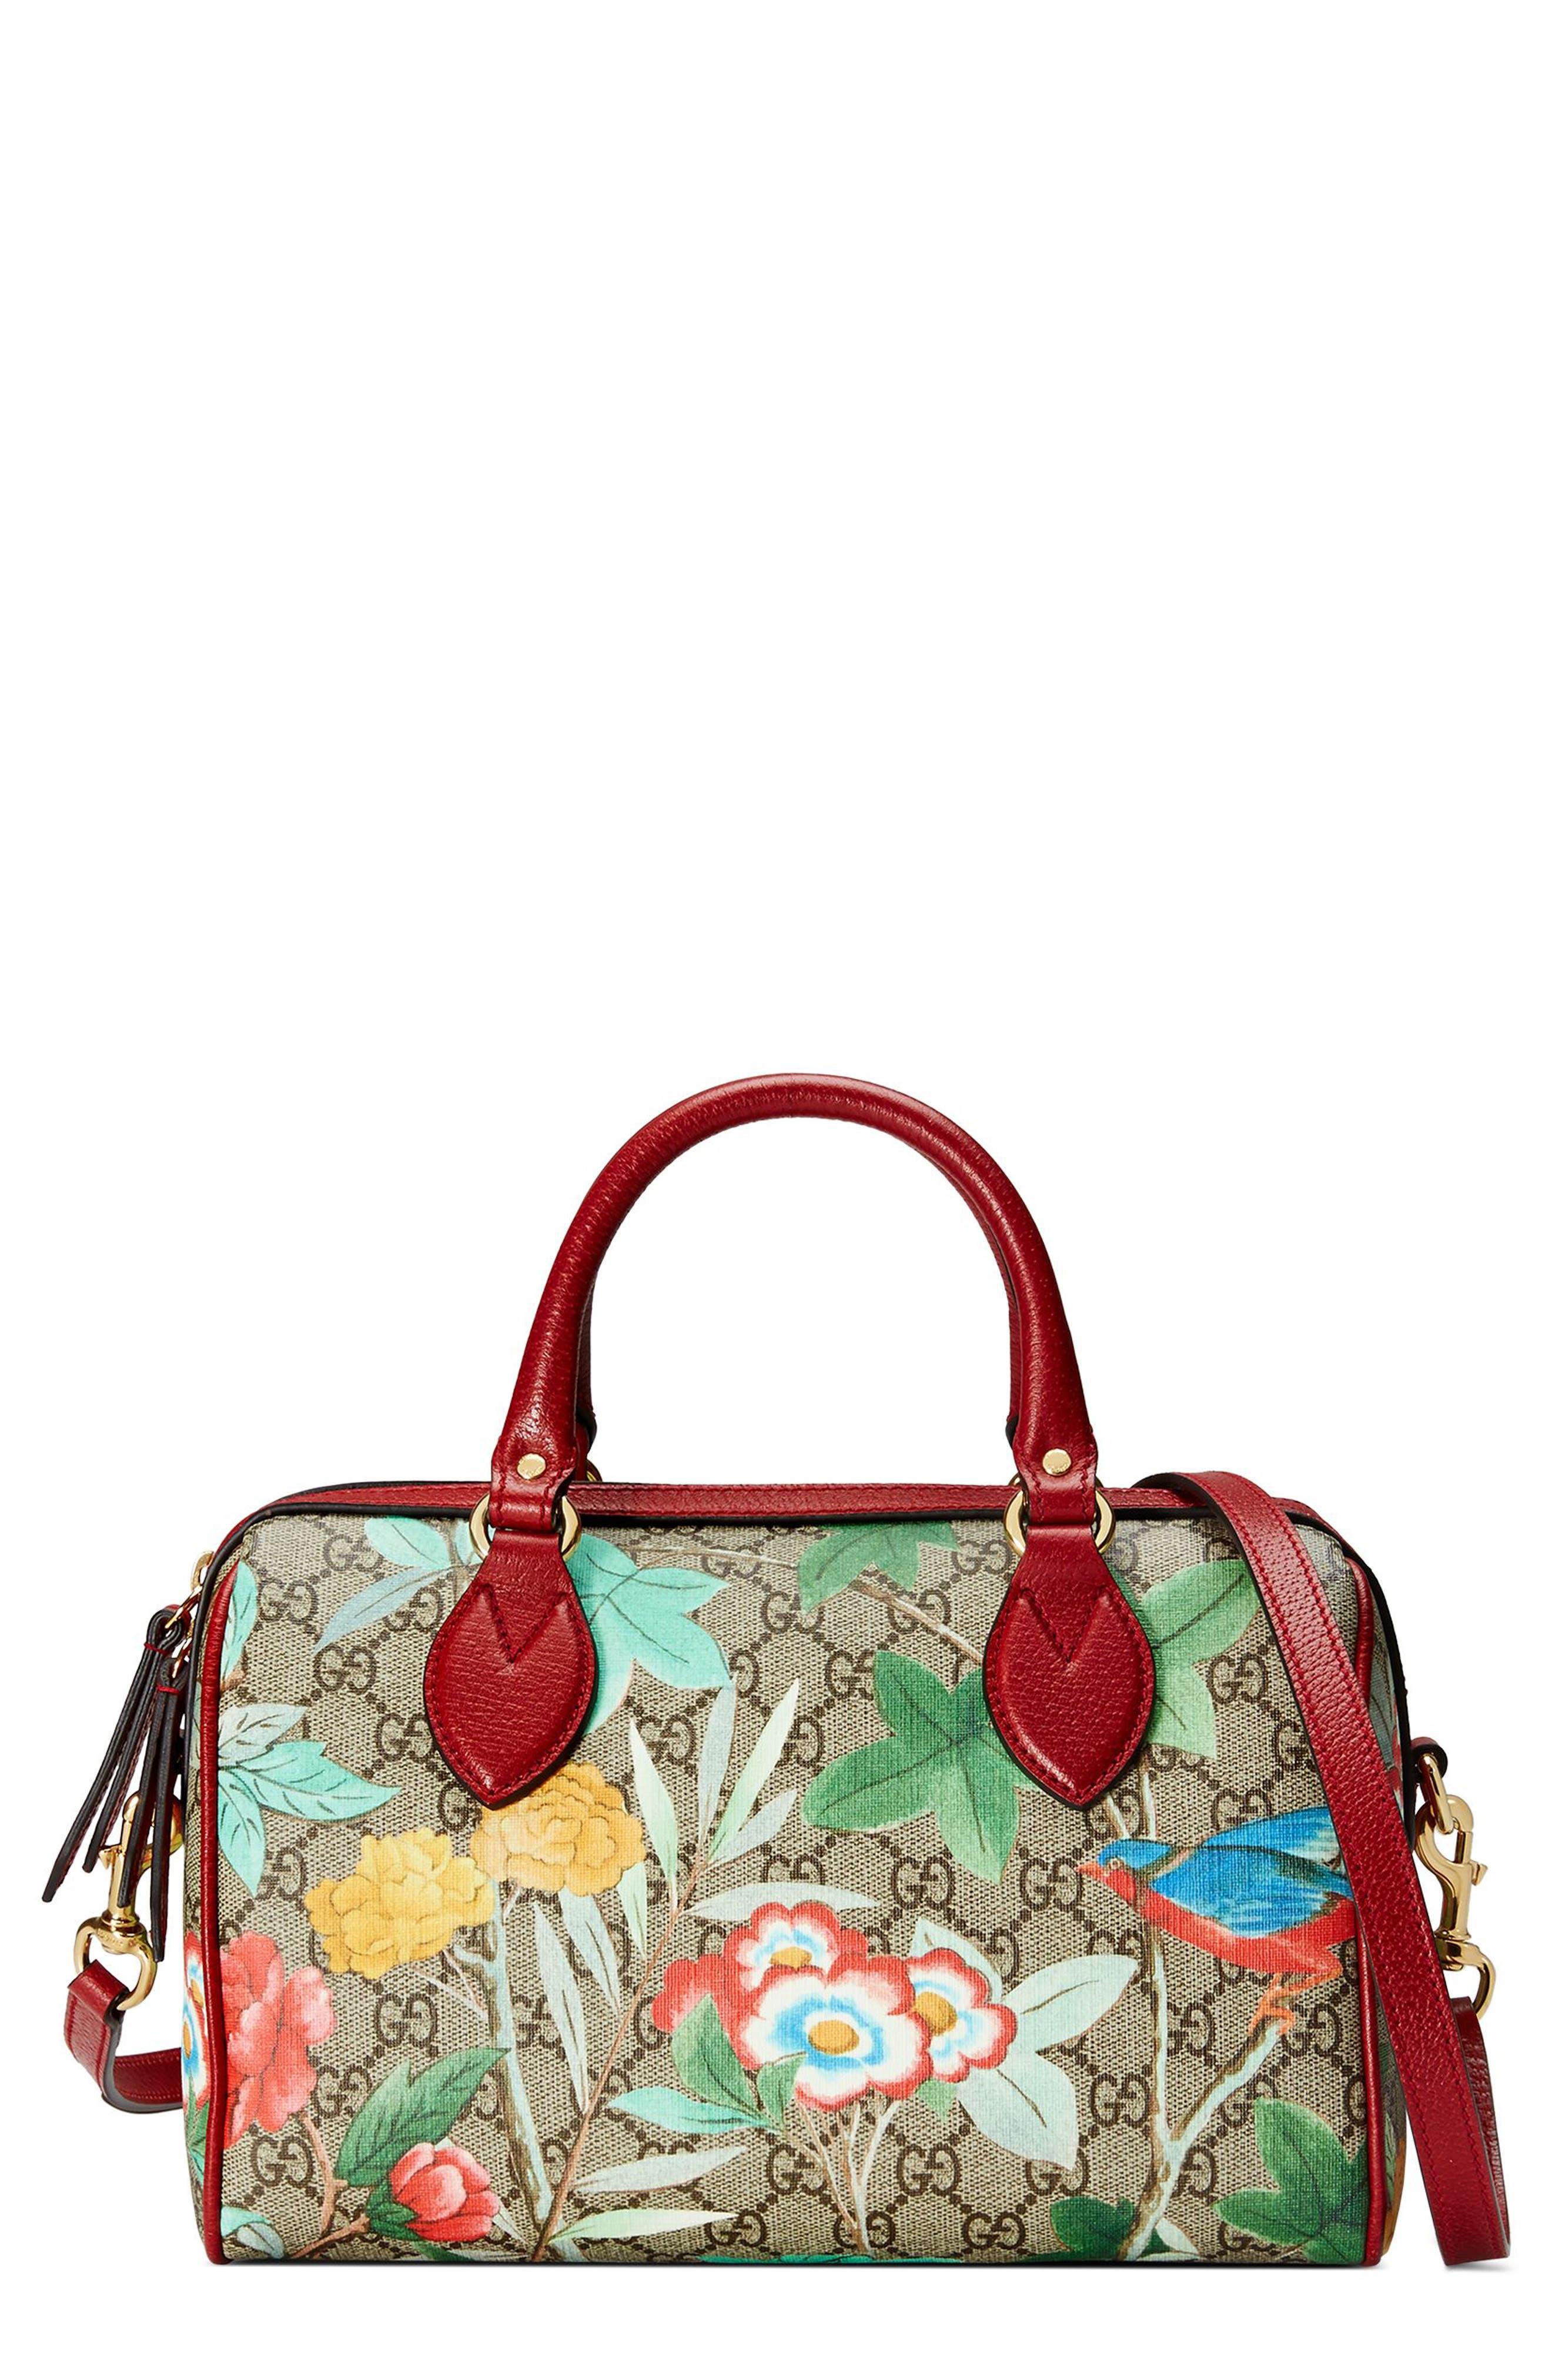 Alternate Image 1 Selected - Gucci Tian Boston GG Supreme Small Canvas Duffel Bag